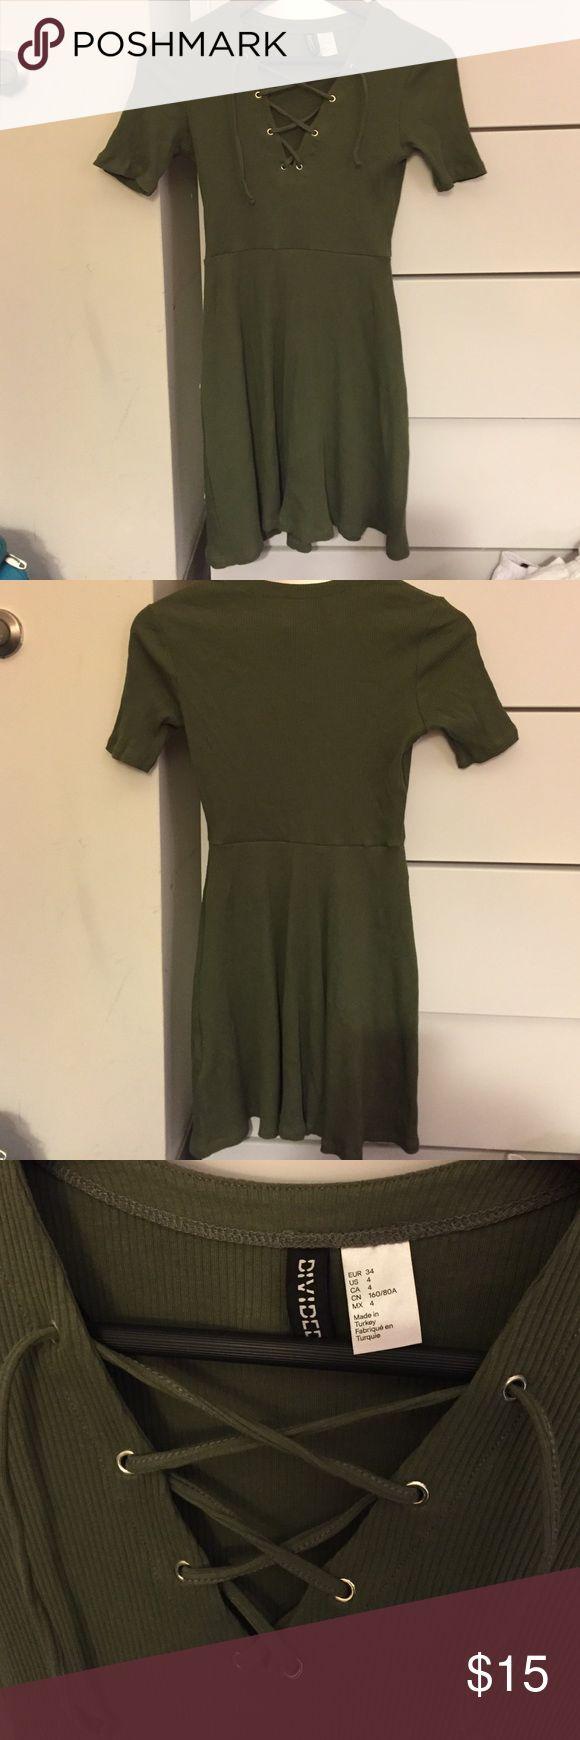 Khaki green dress Dress with lace up detail H&M Dresses Mini